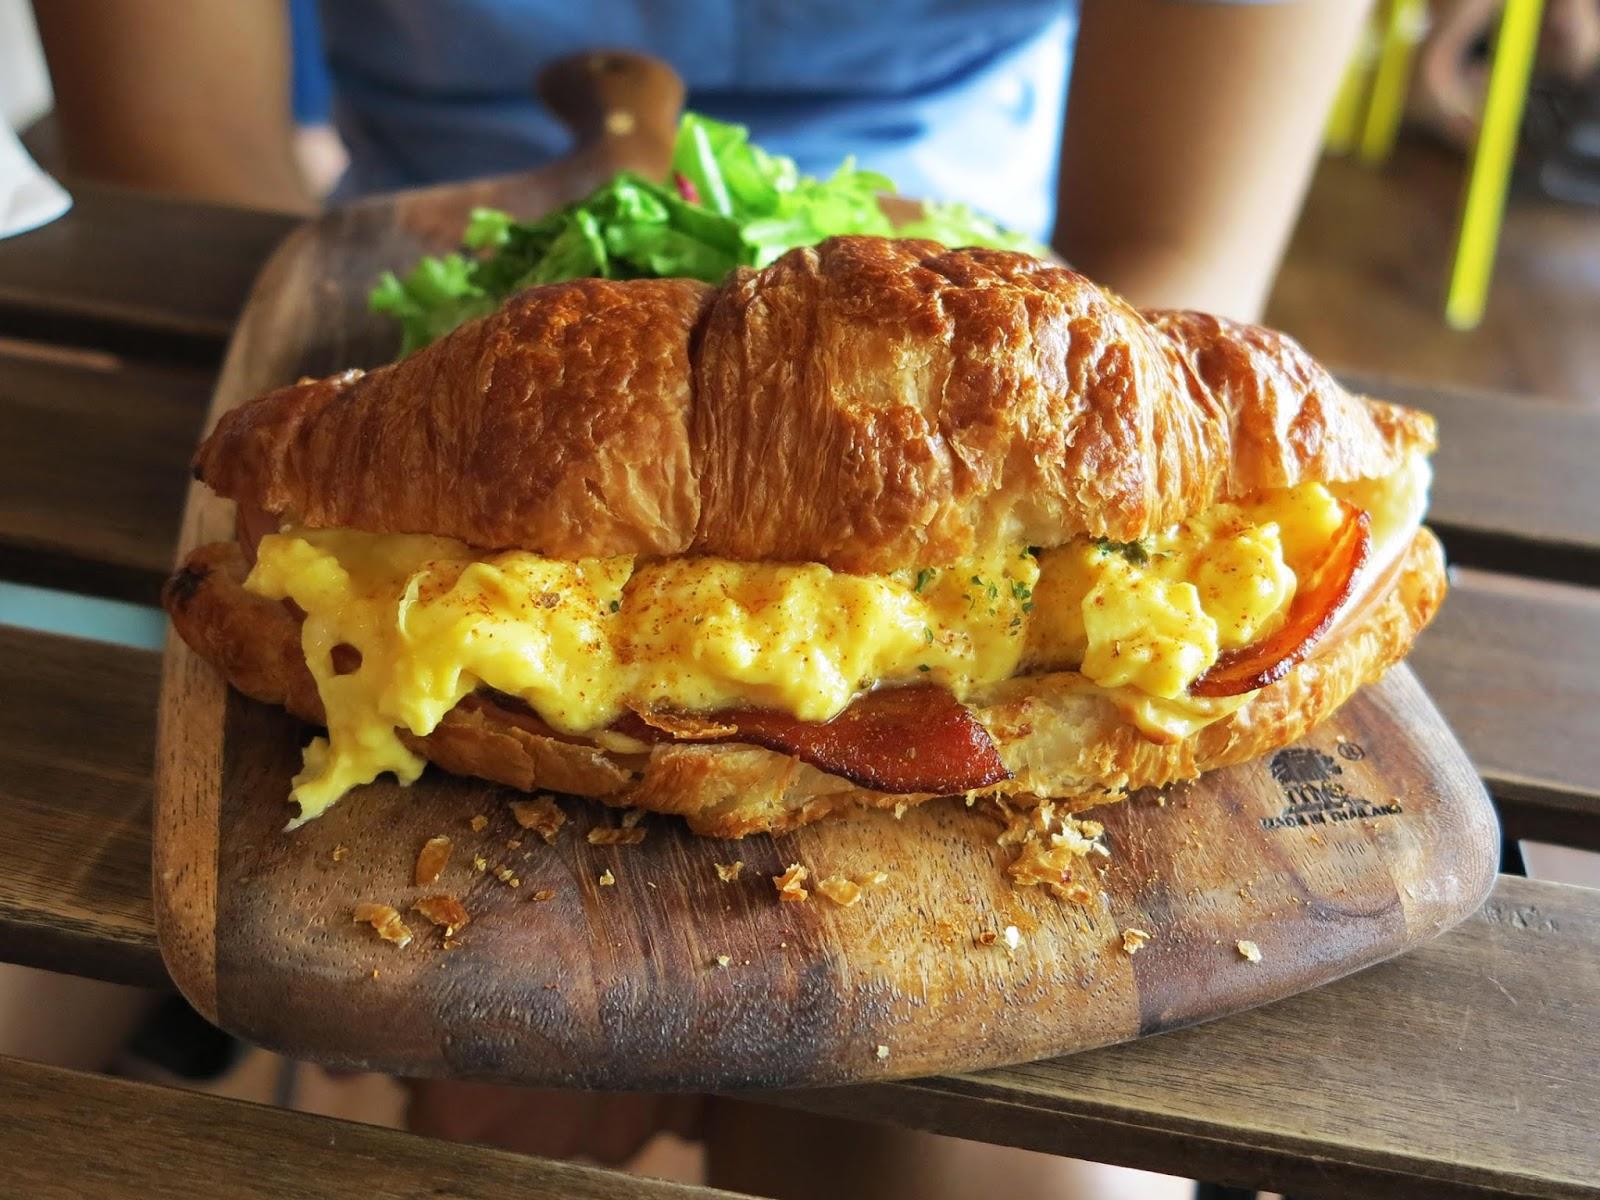 Breakfast Butter Croissant